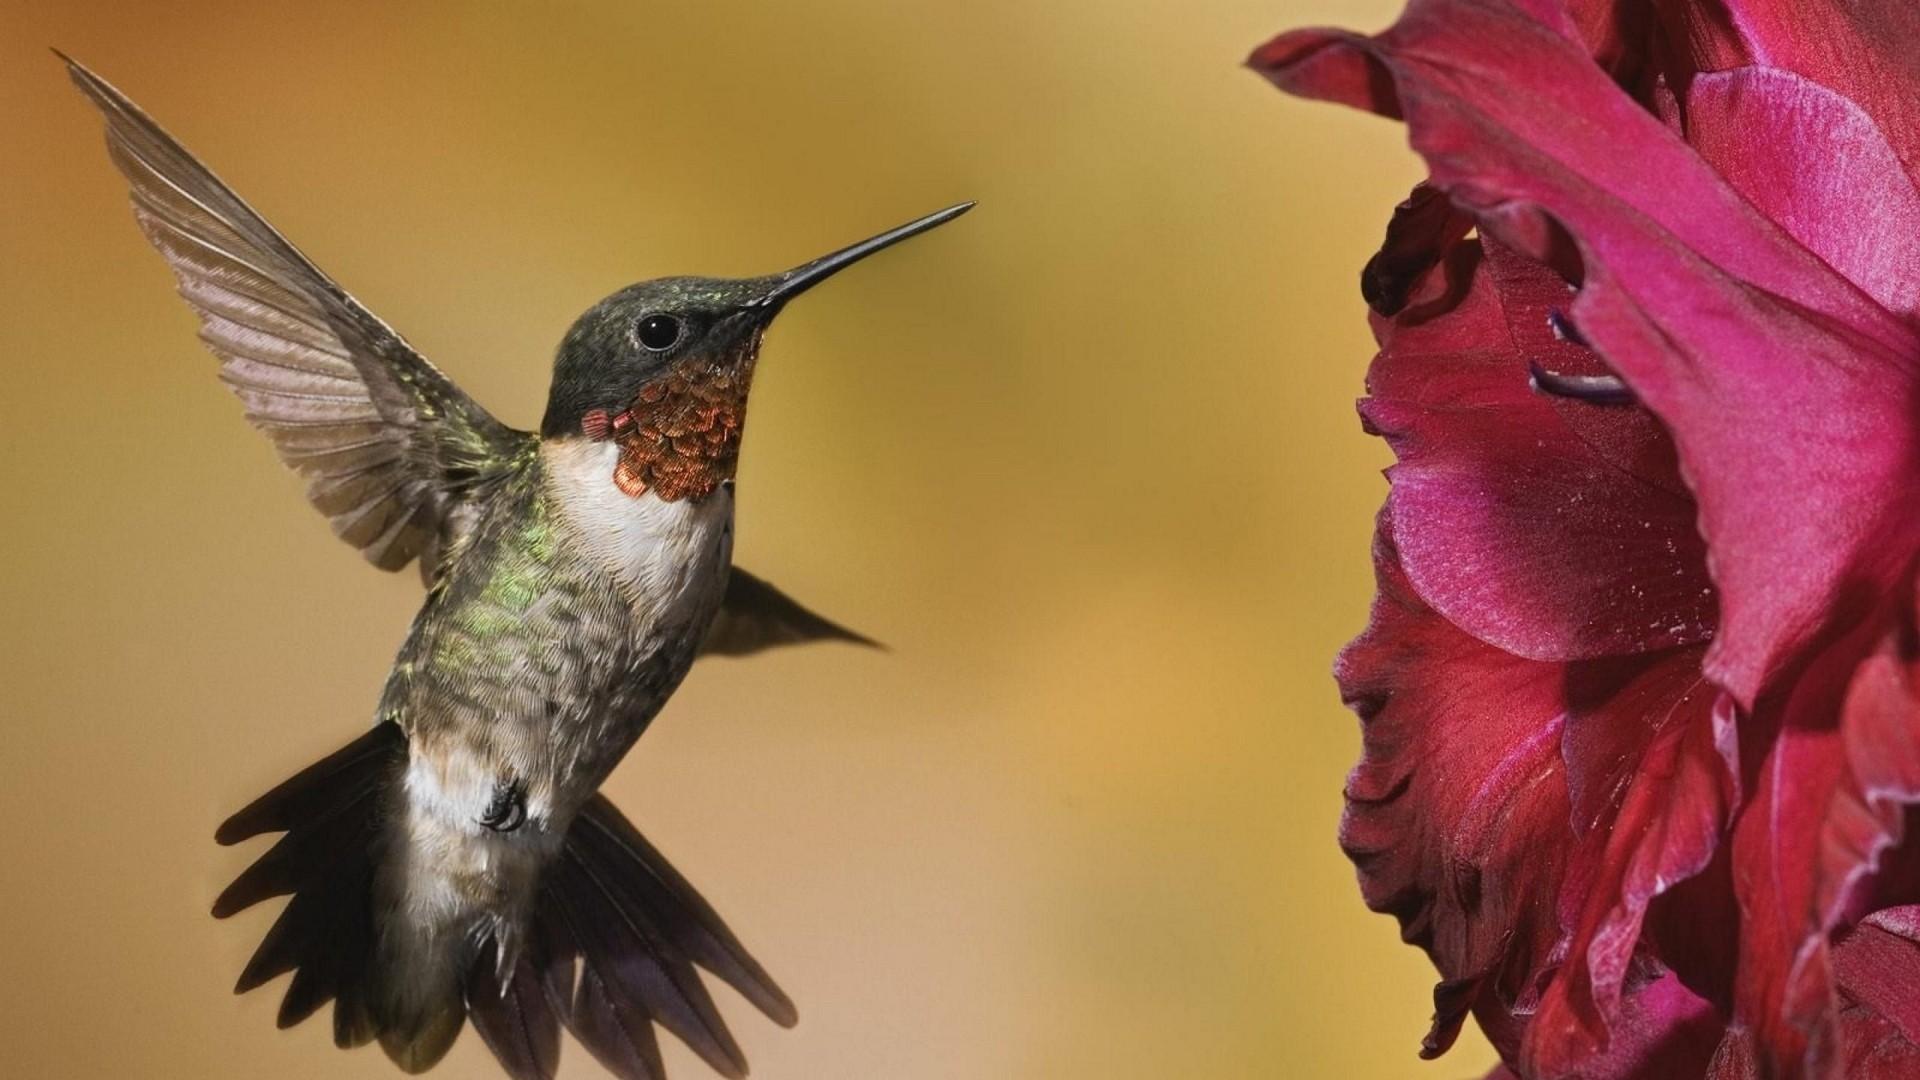 Hummingbird hd wallpaper download